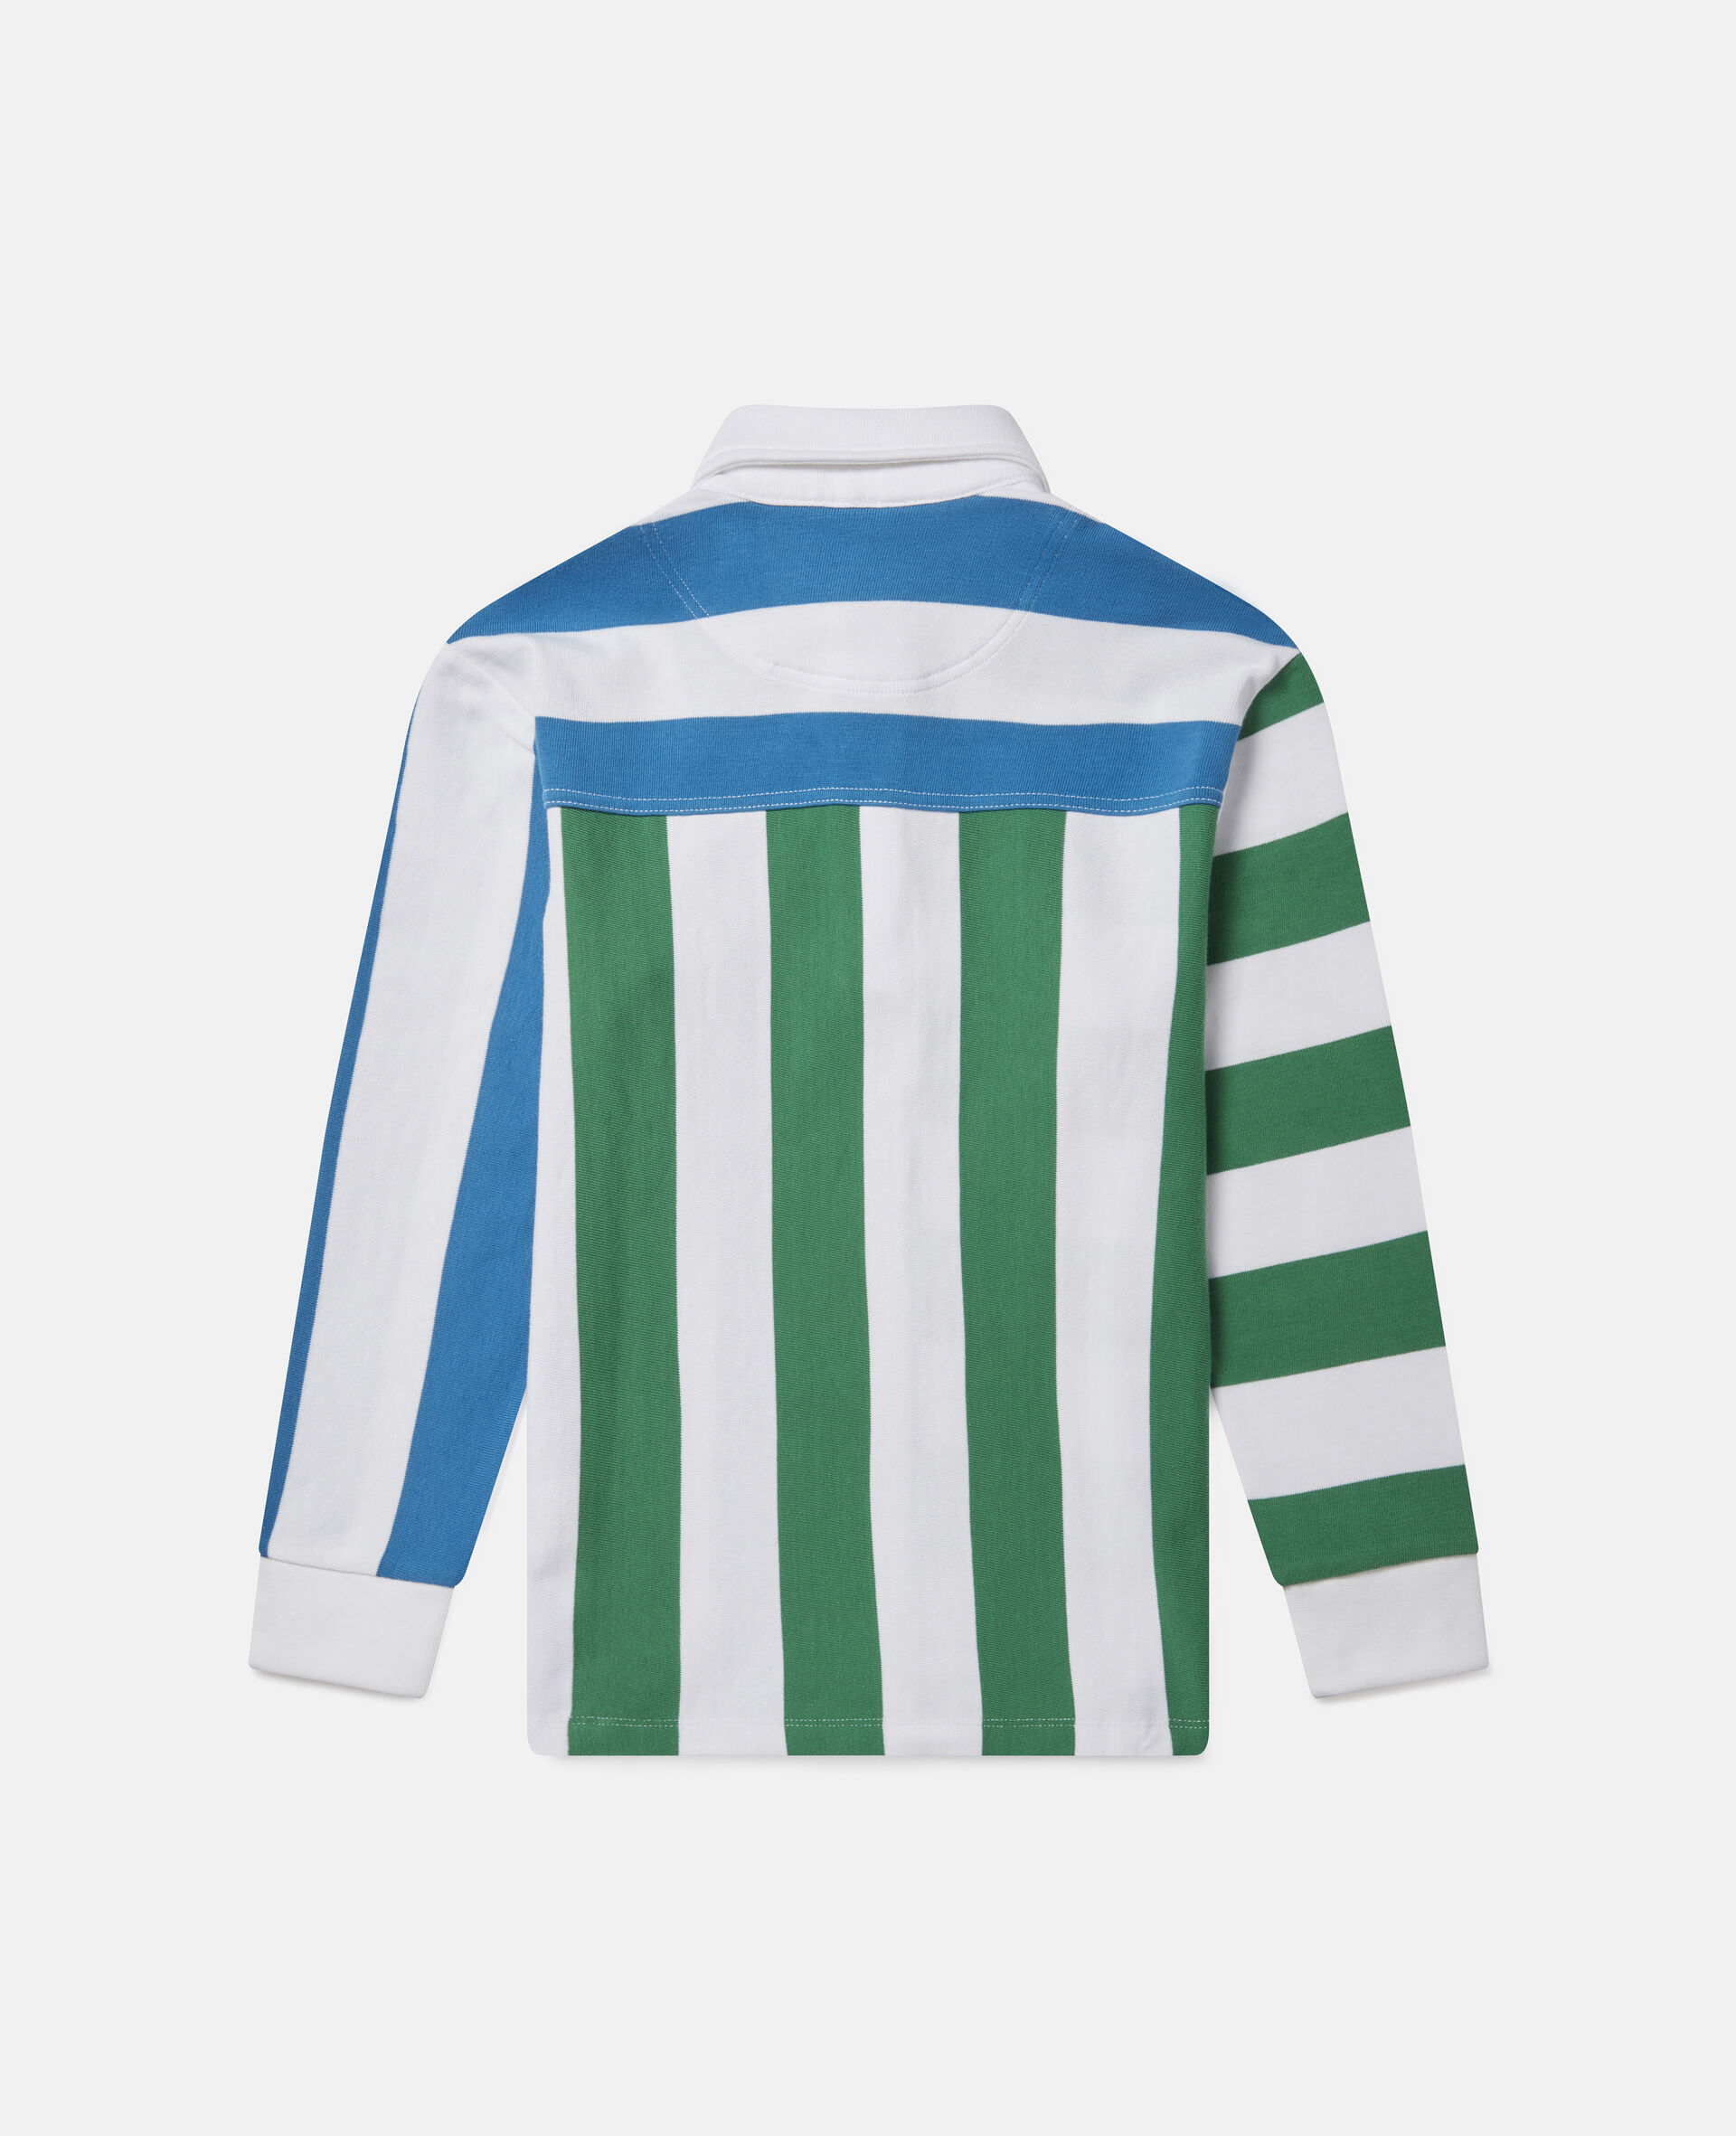 Colourblock Striped Oversized Shirt-Multicolour-large image number 2